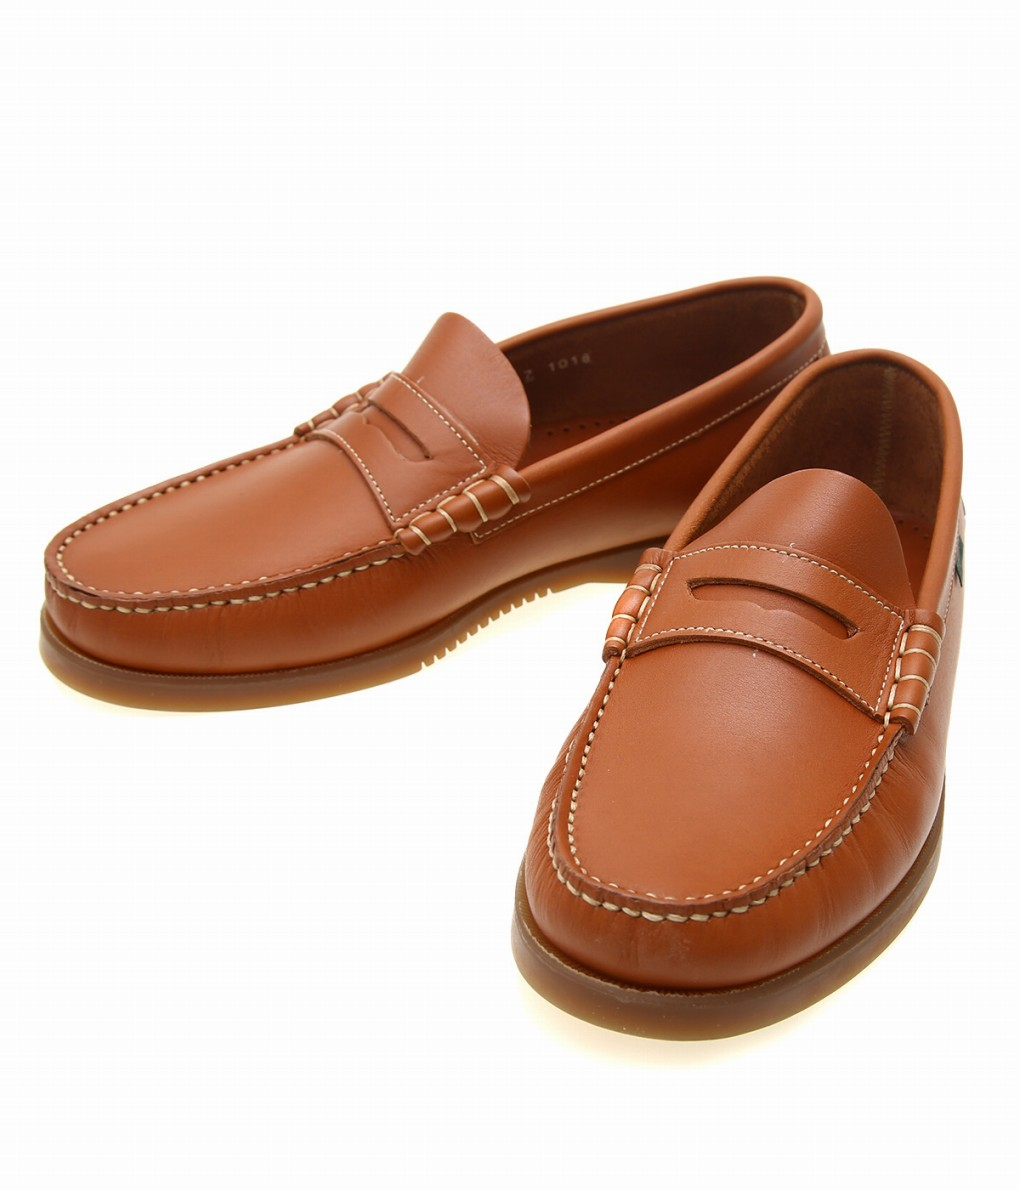 paraboot / パラブーツ : CORAUX / Cuir Lisse smooth -Whisky- : ドレス シューズ ローファー 靴 メンズ : 93622【MUS】